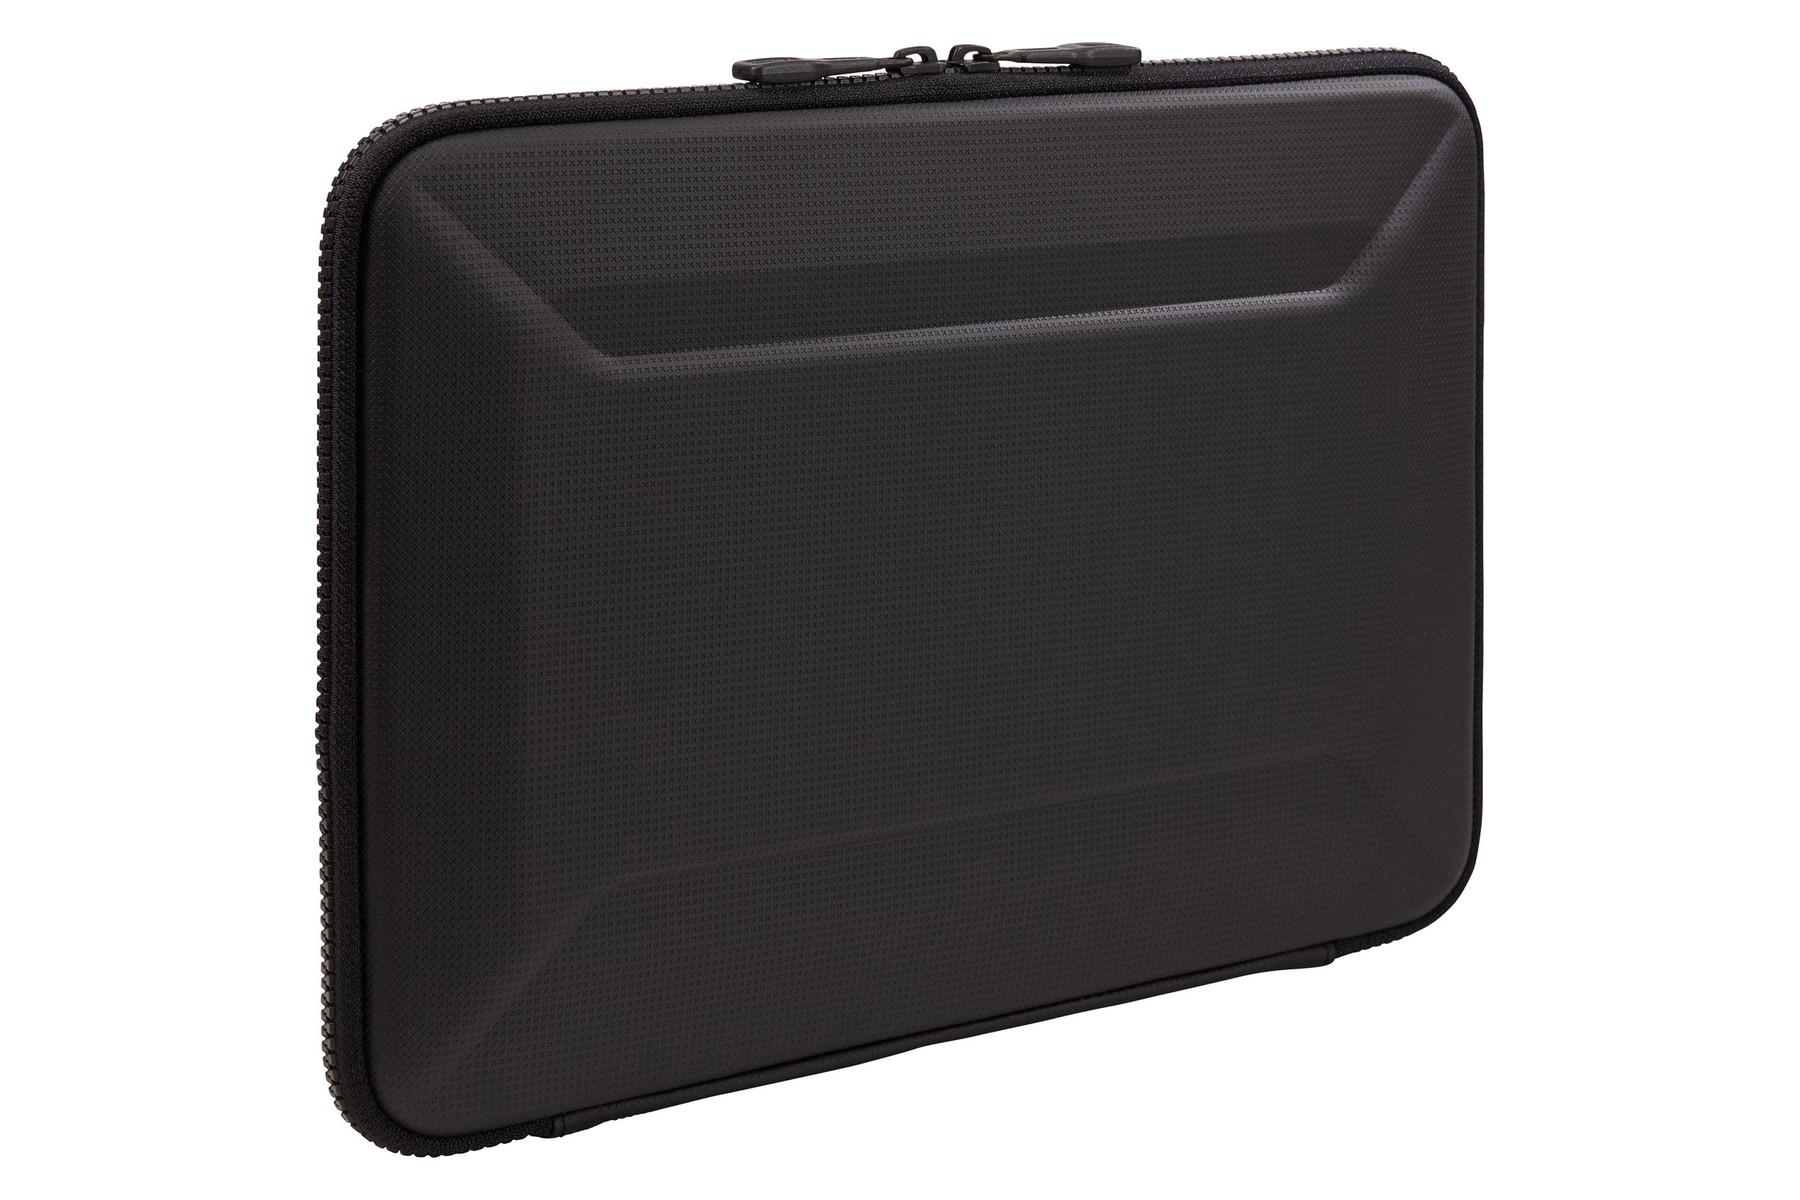 "Thule Gauntlet TGAE2356 16"" Laptop Bag - Alsi Shop Qatar"